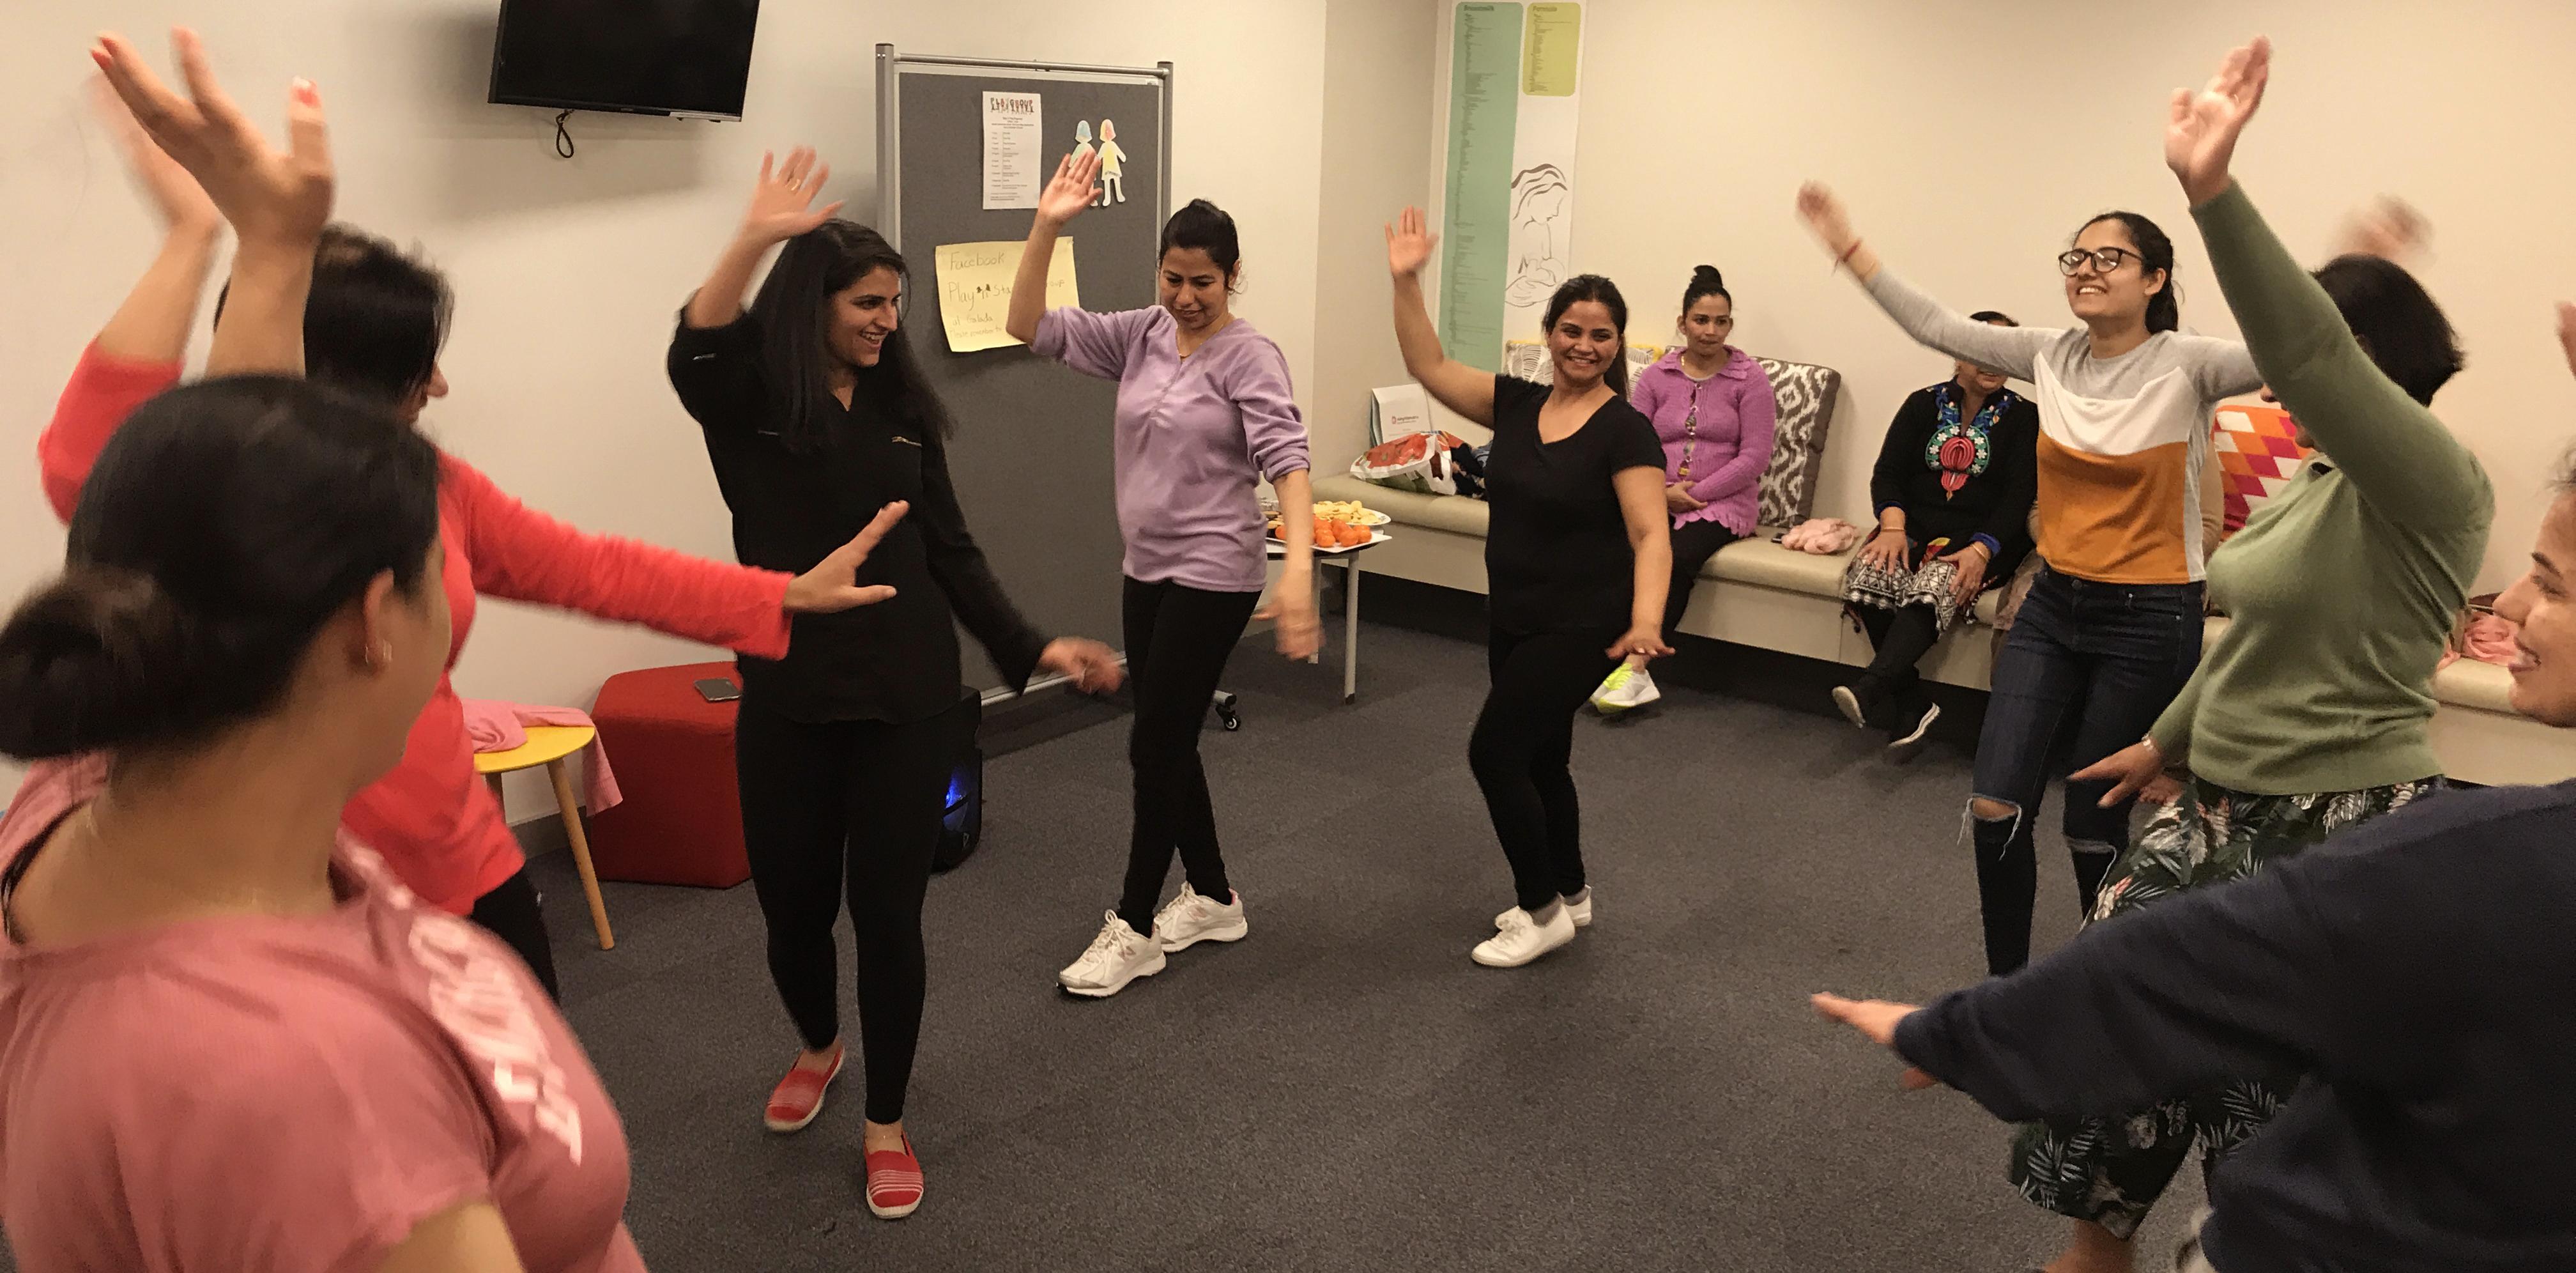 Women dance in a classroom.